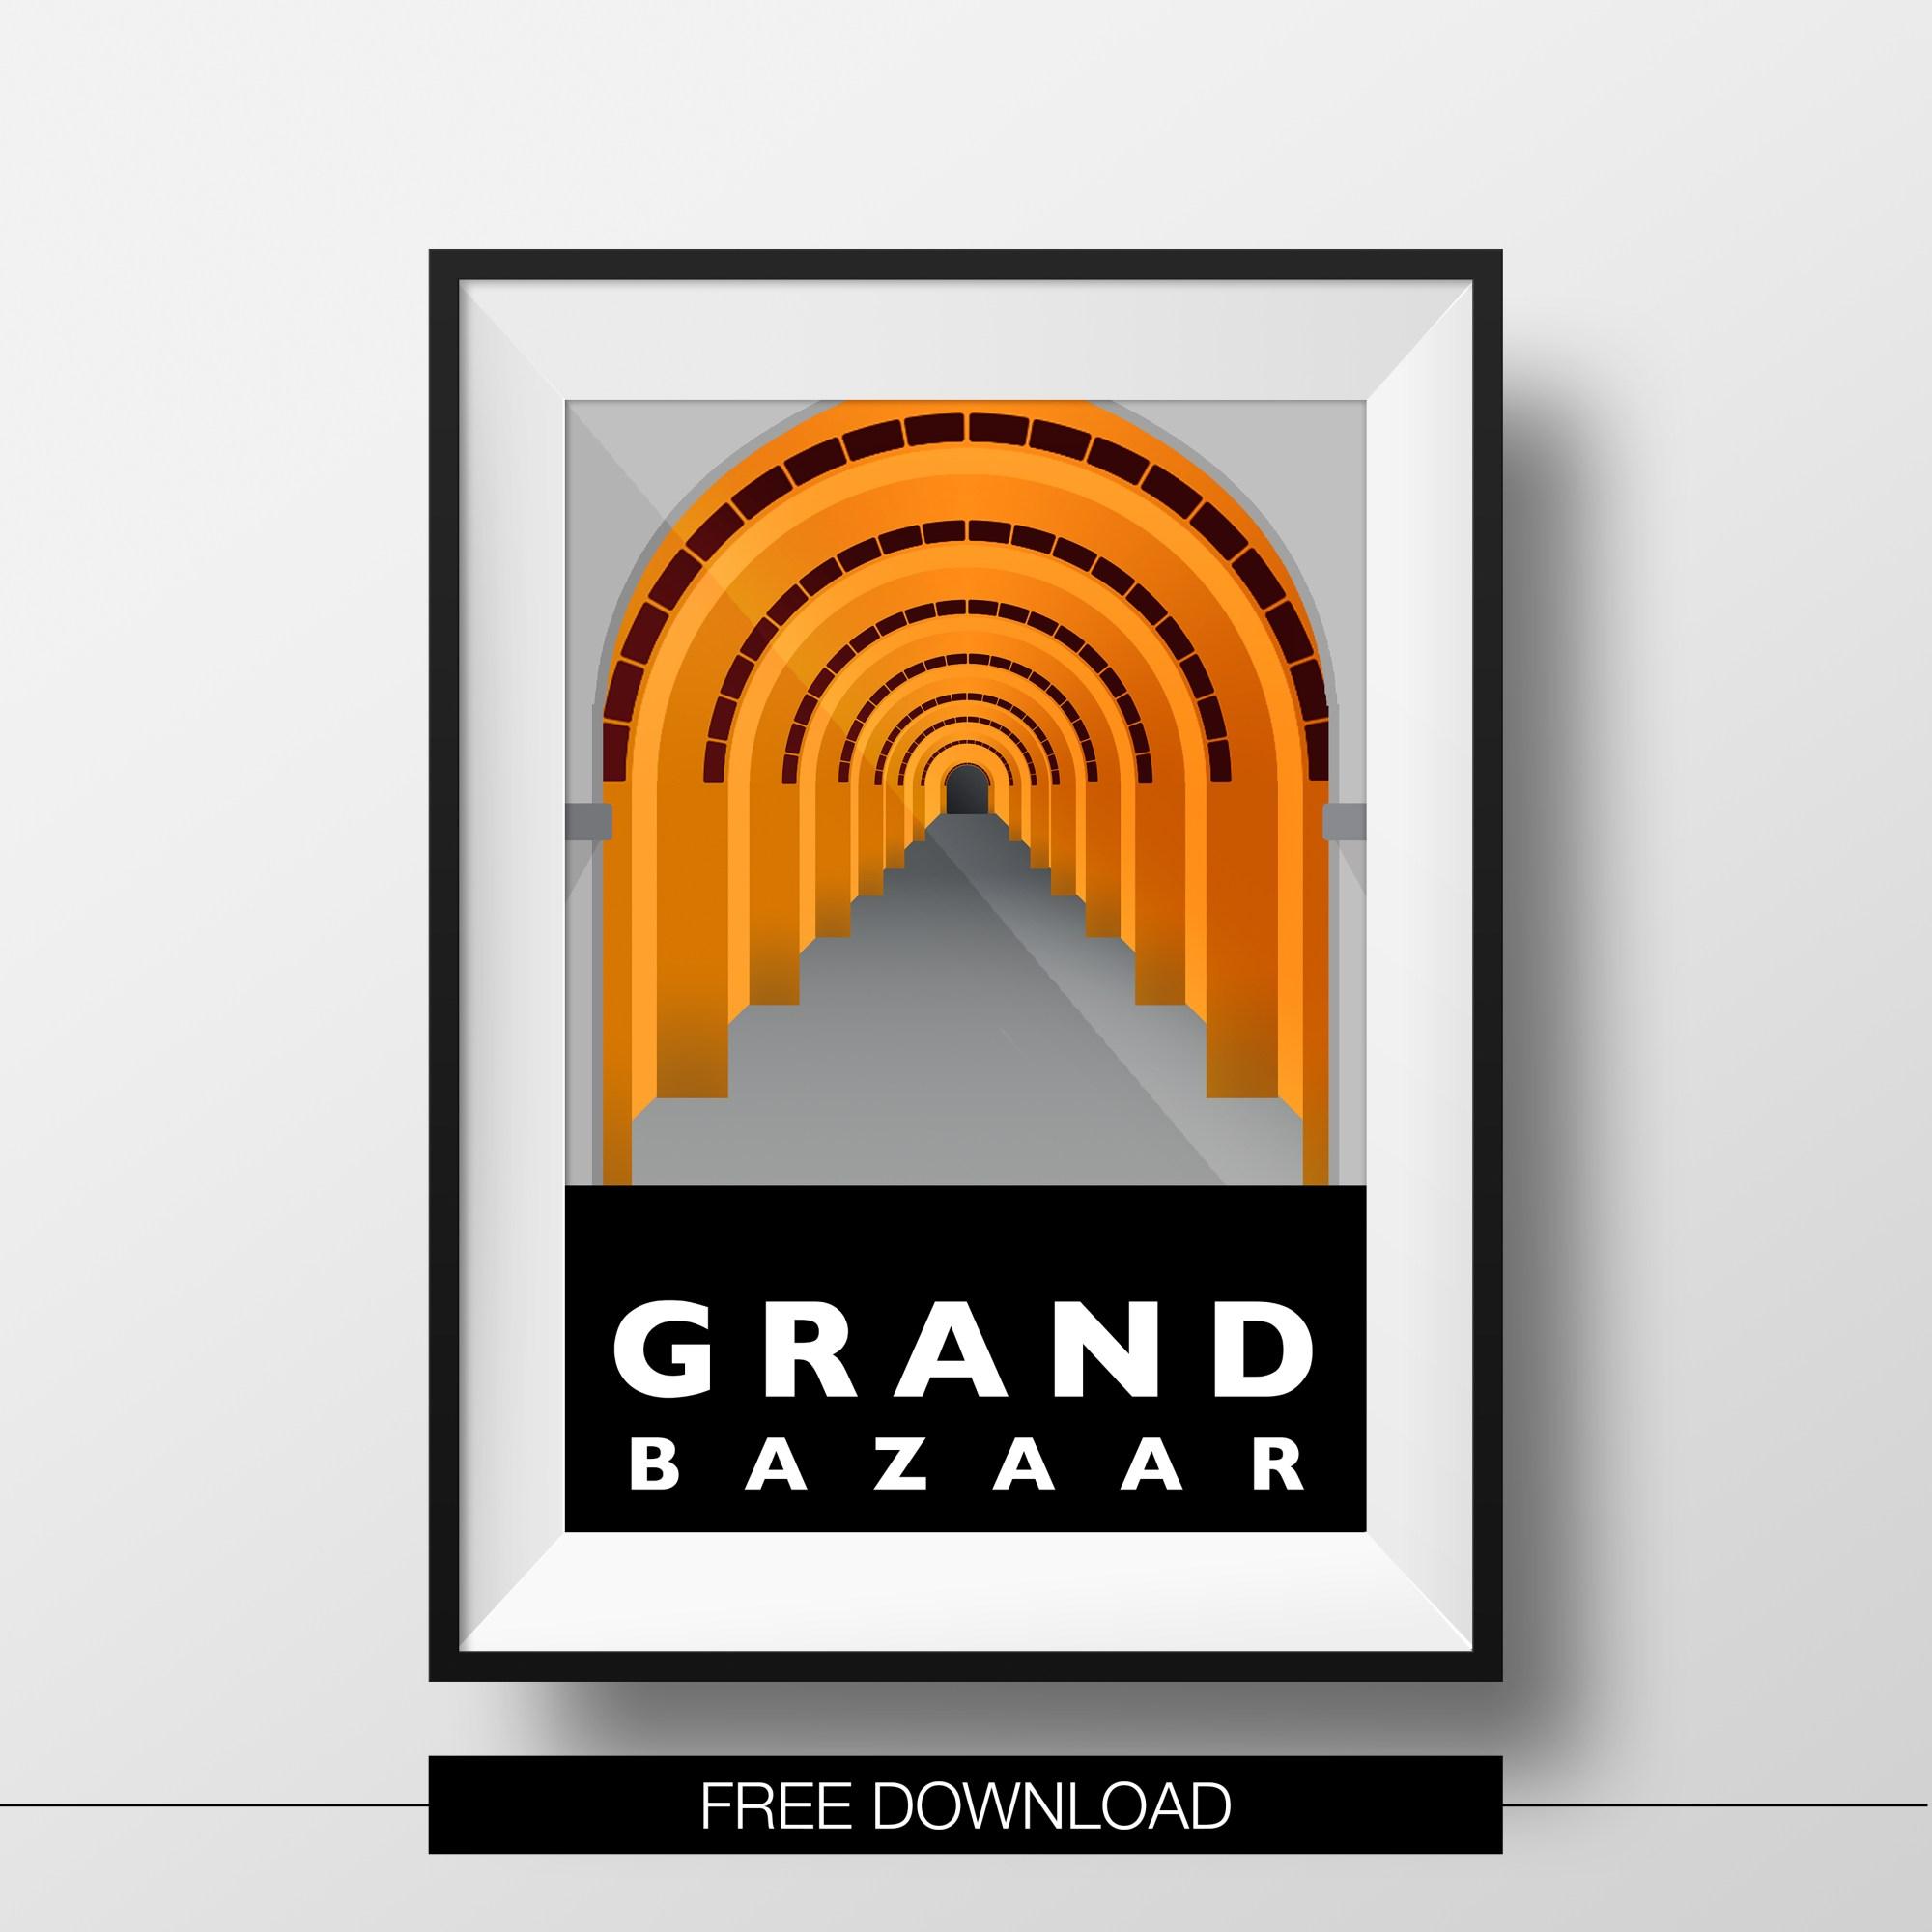 poster-istanbul-landmarks-grand-bazaar-free-download